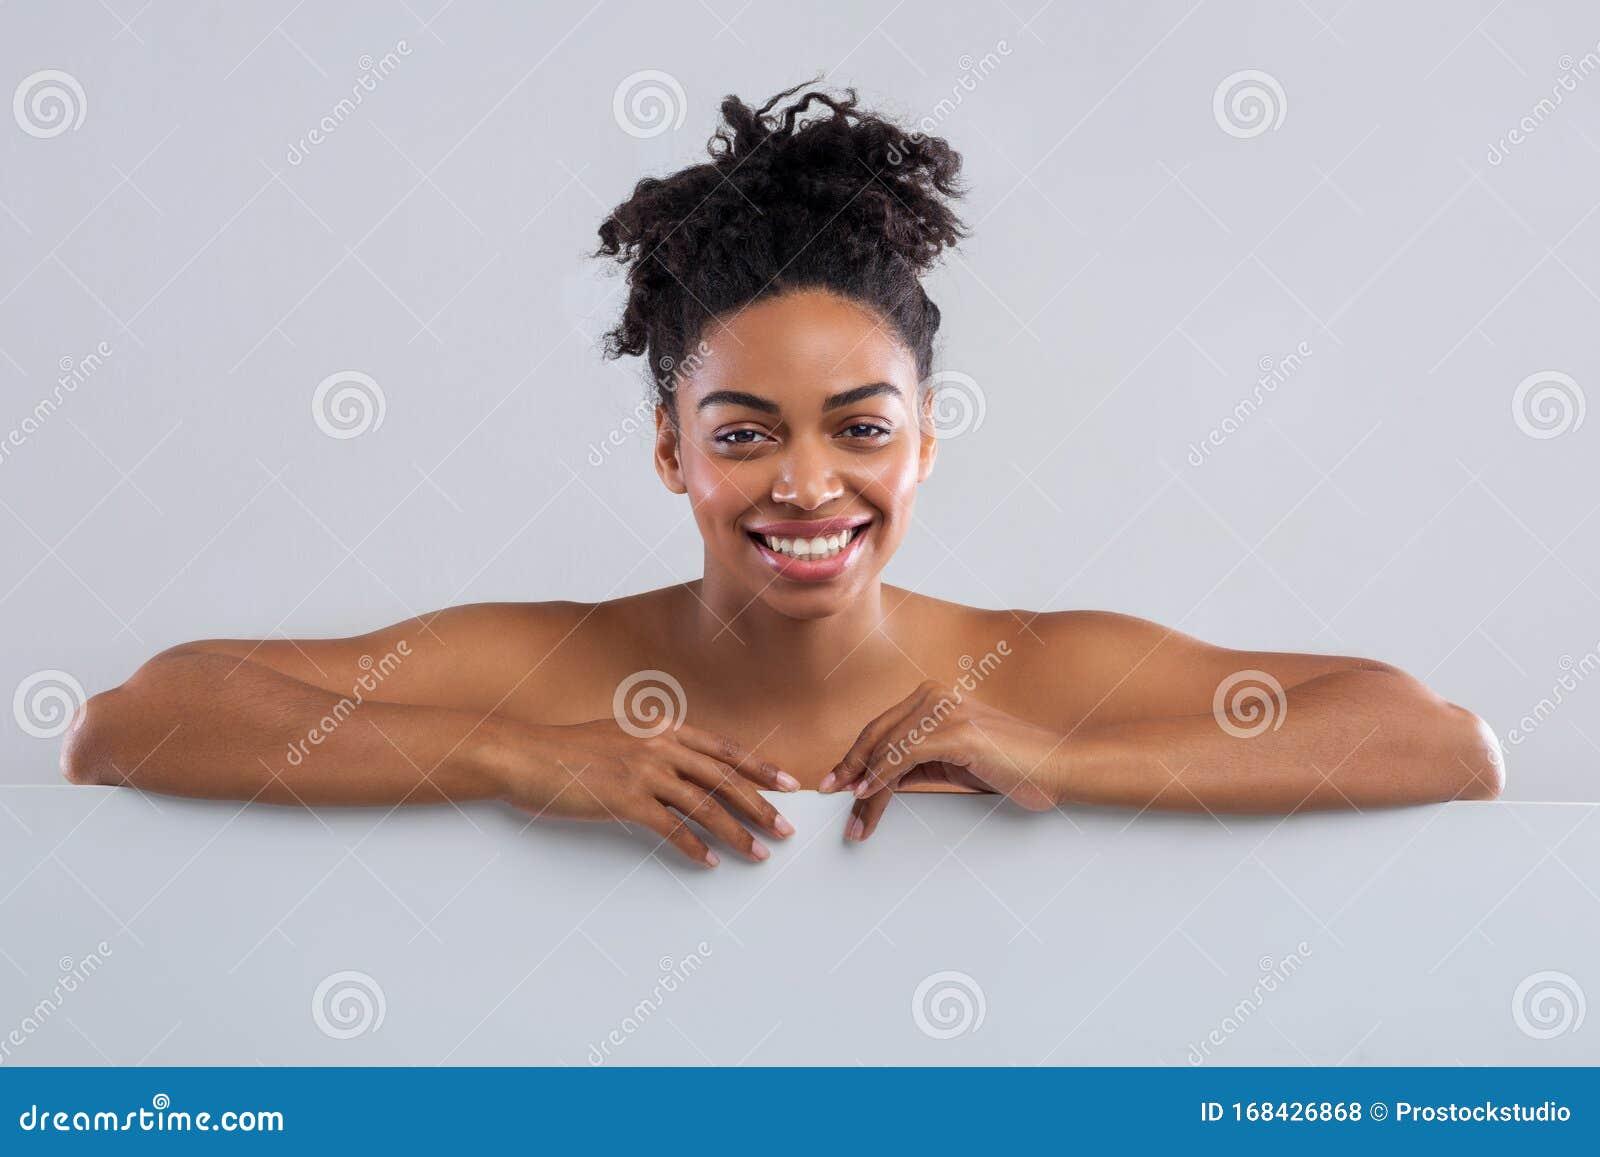 Free nude black pic